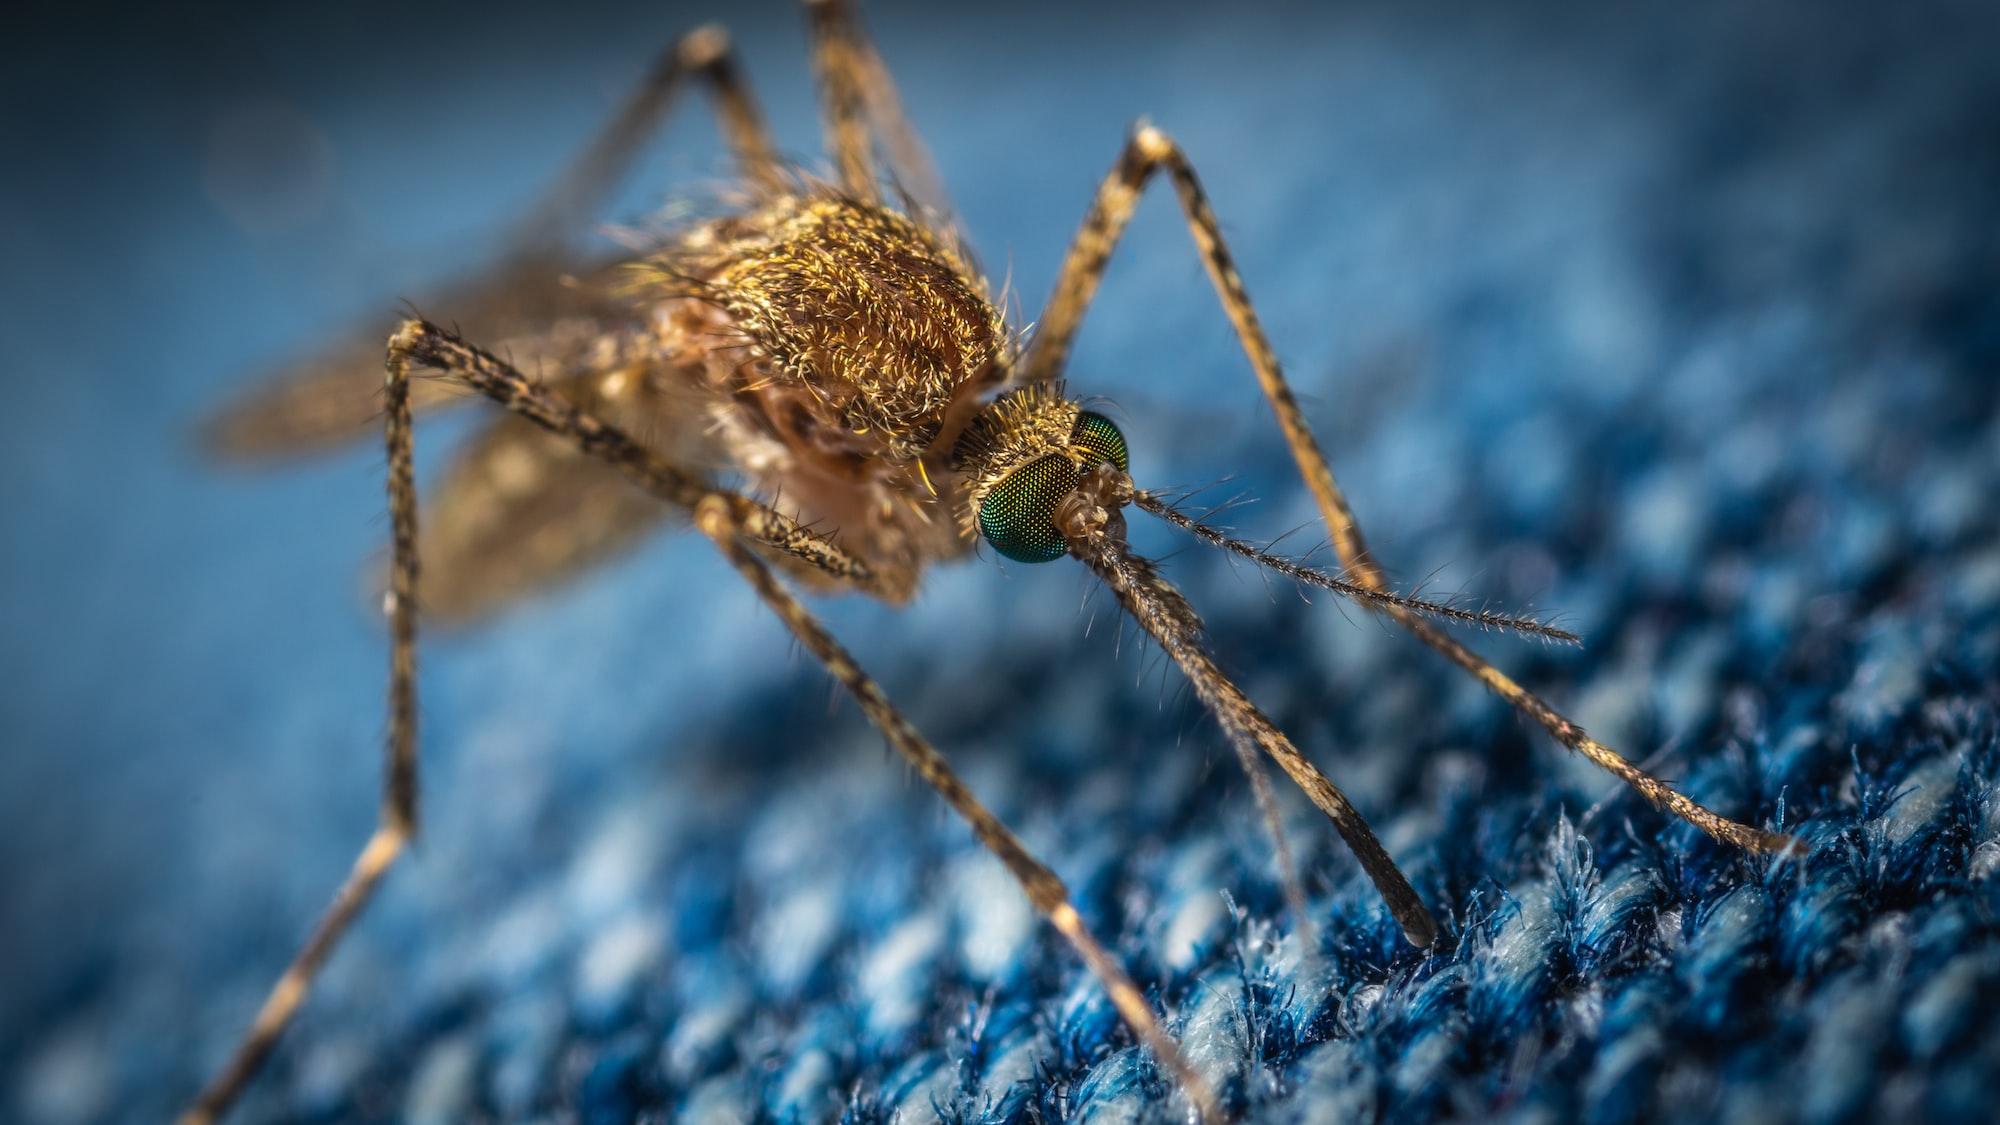 🦟 Malaysia records zero domestic Malaria cases for the second year in a row